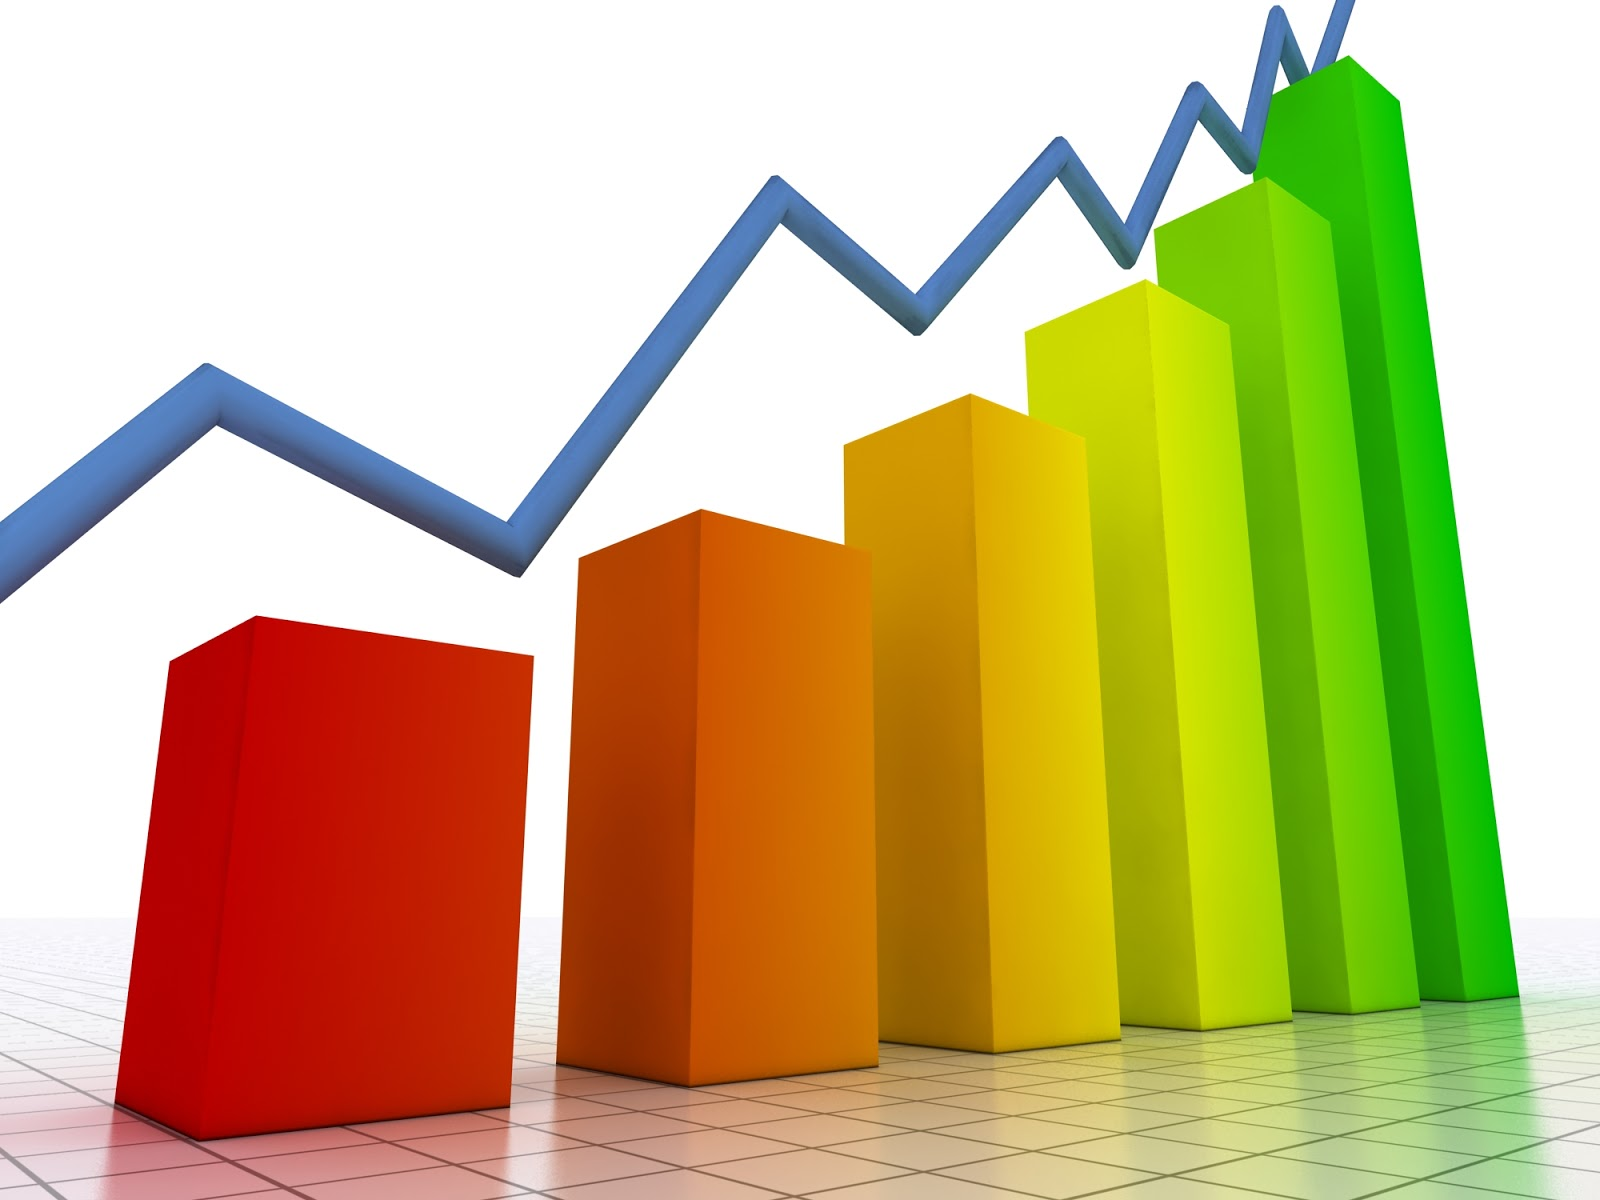 Trends in Online Marketing